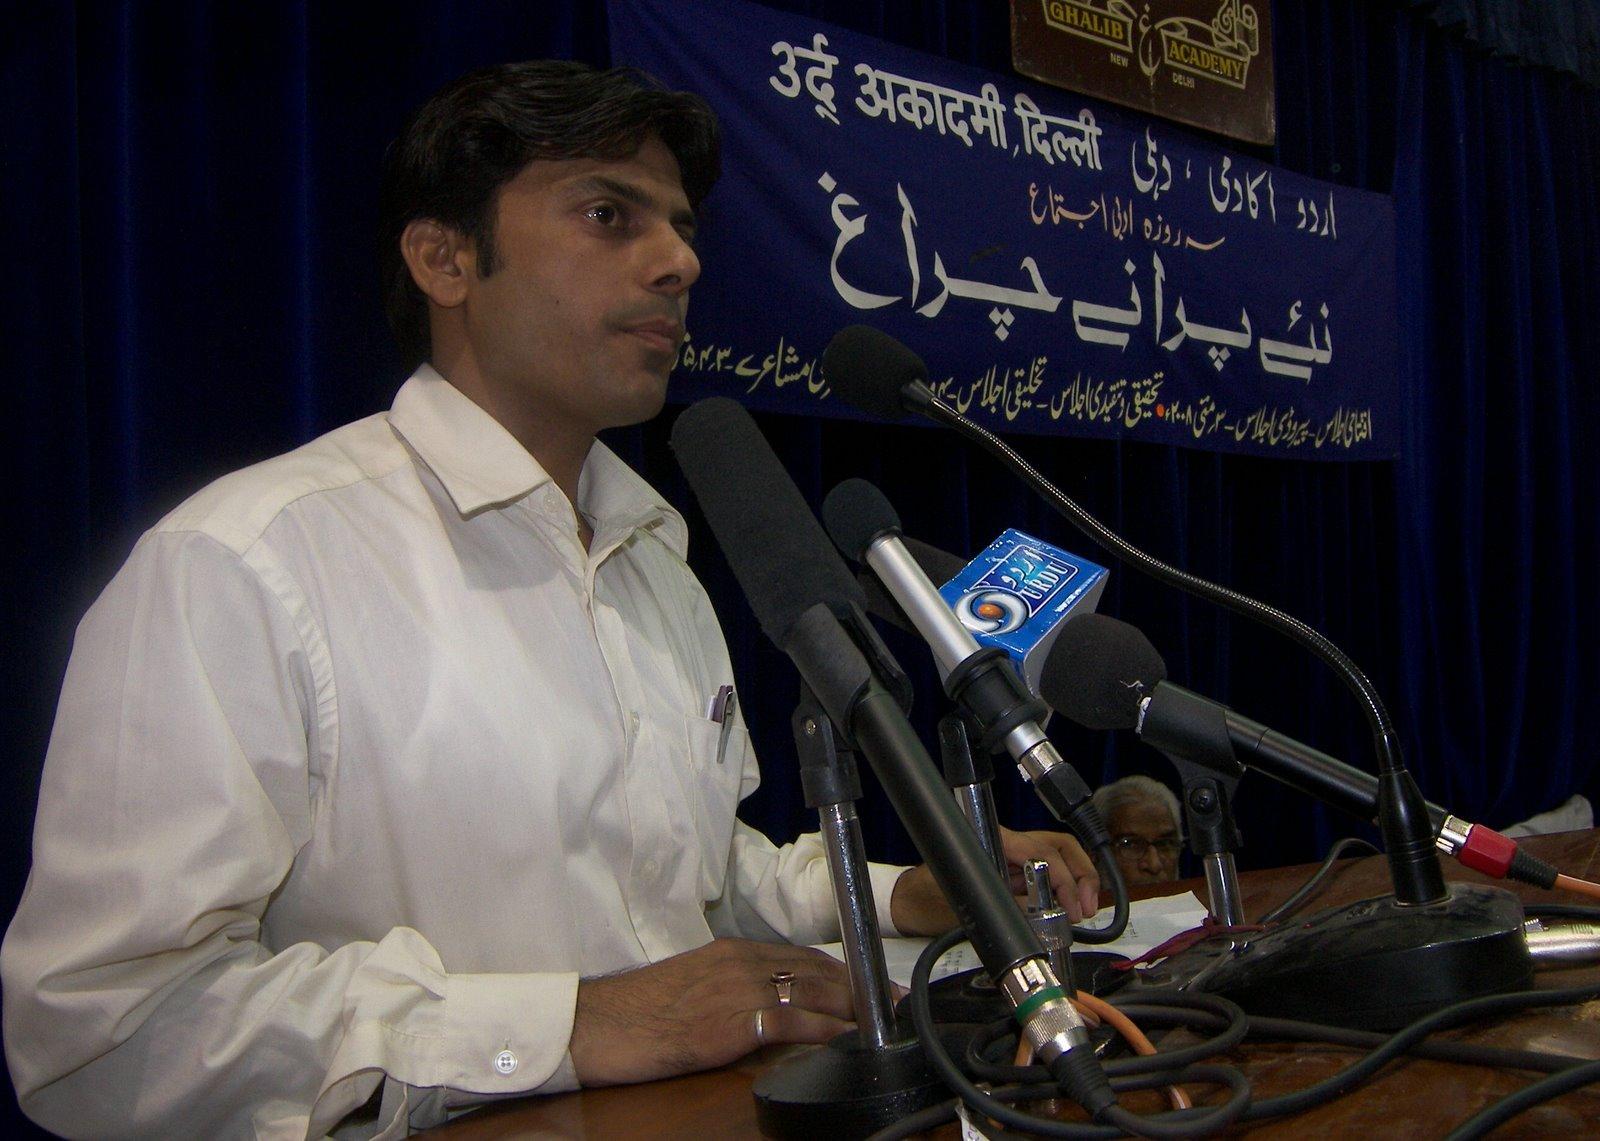 [jatinder+parwaaz+partisipate+in+mushaira+]